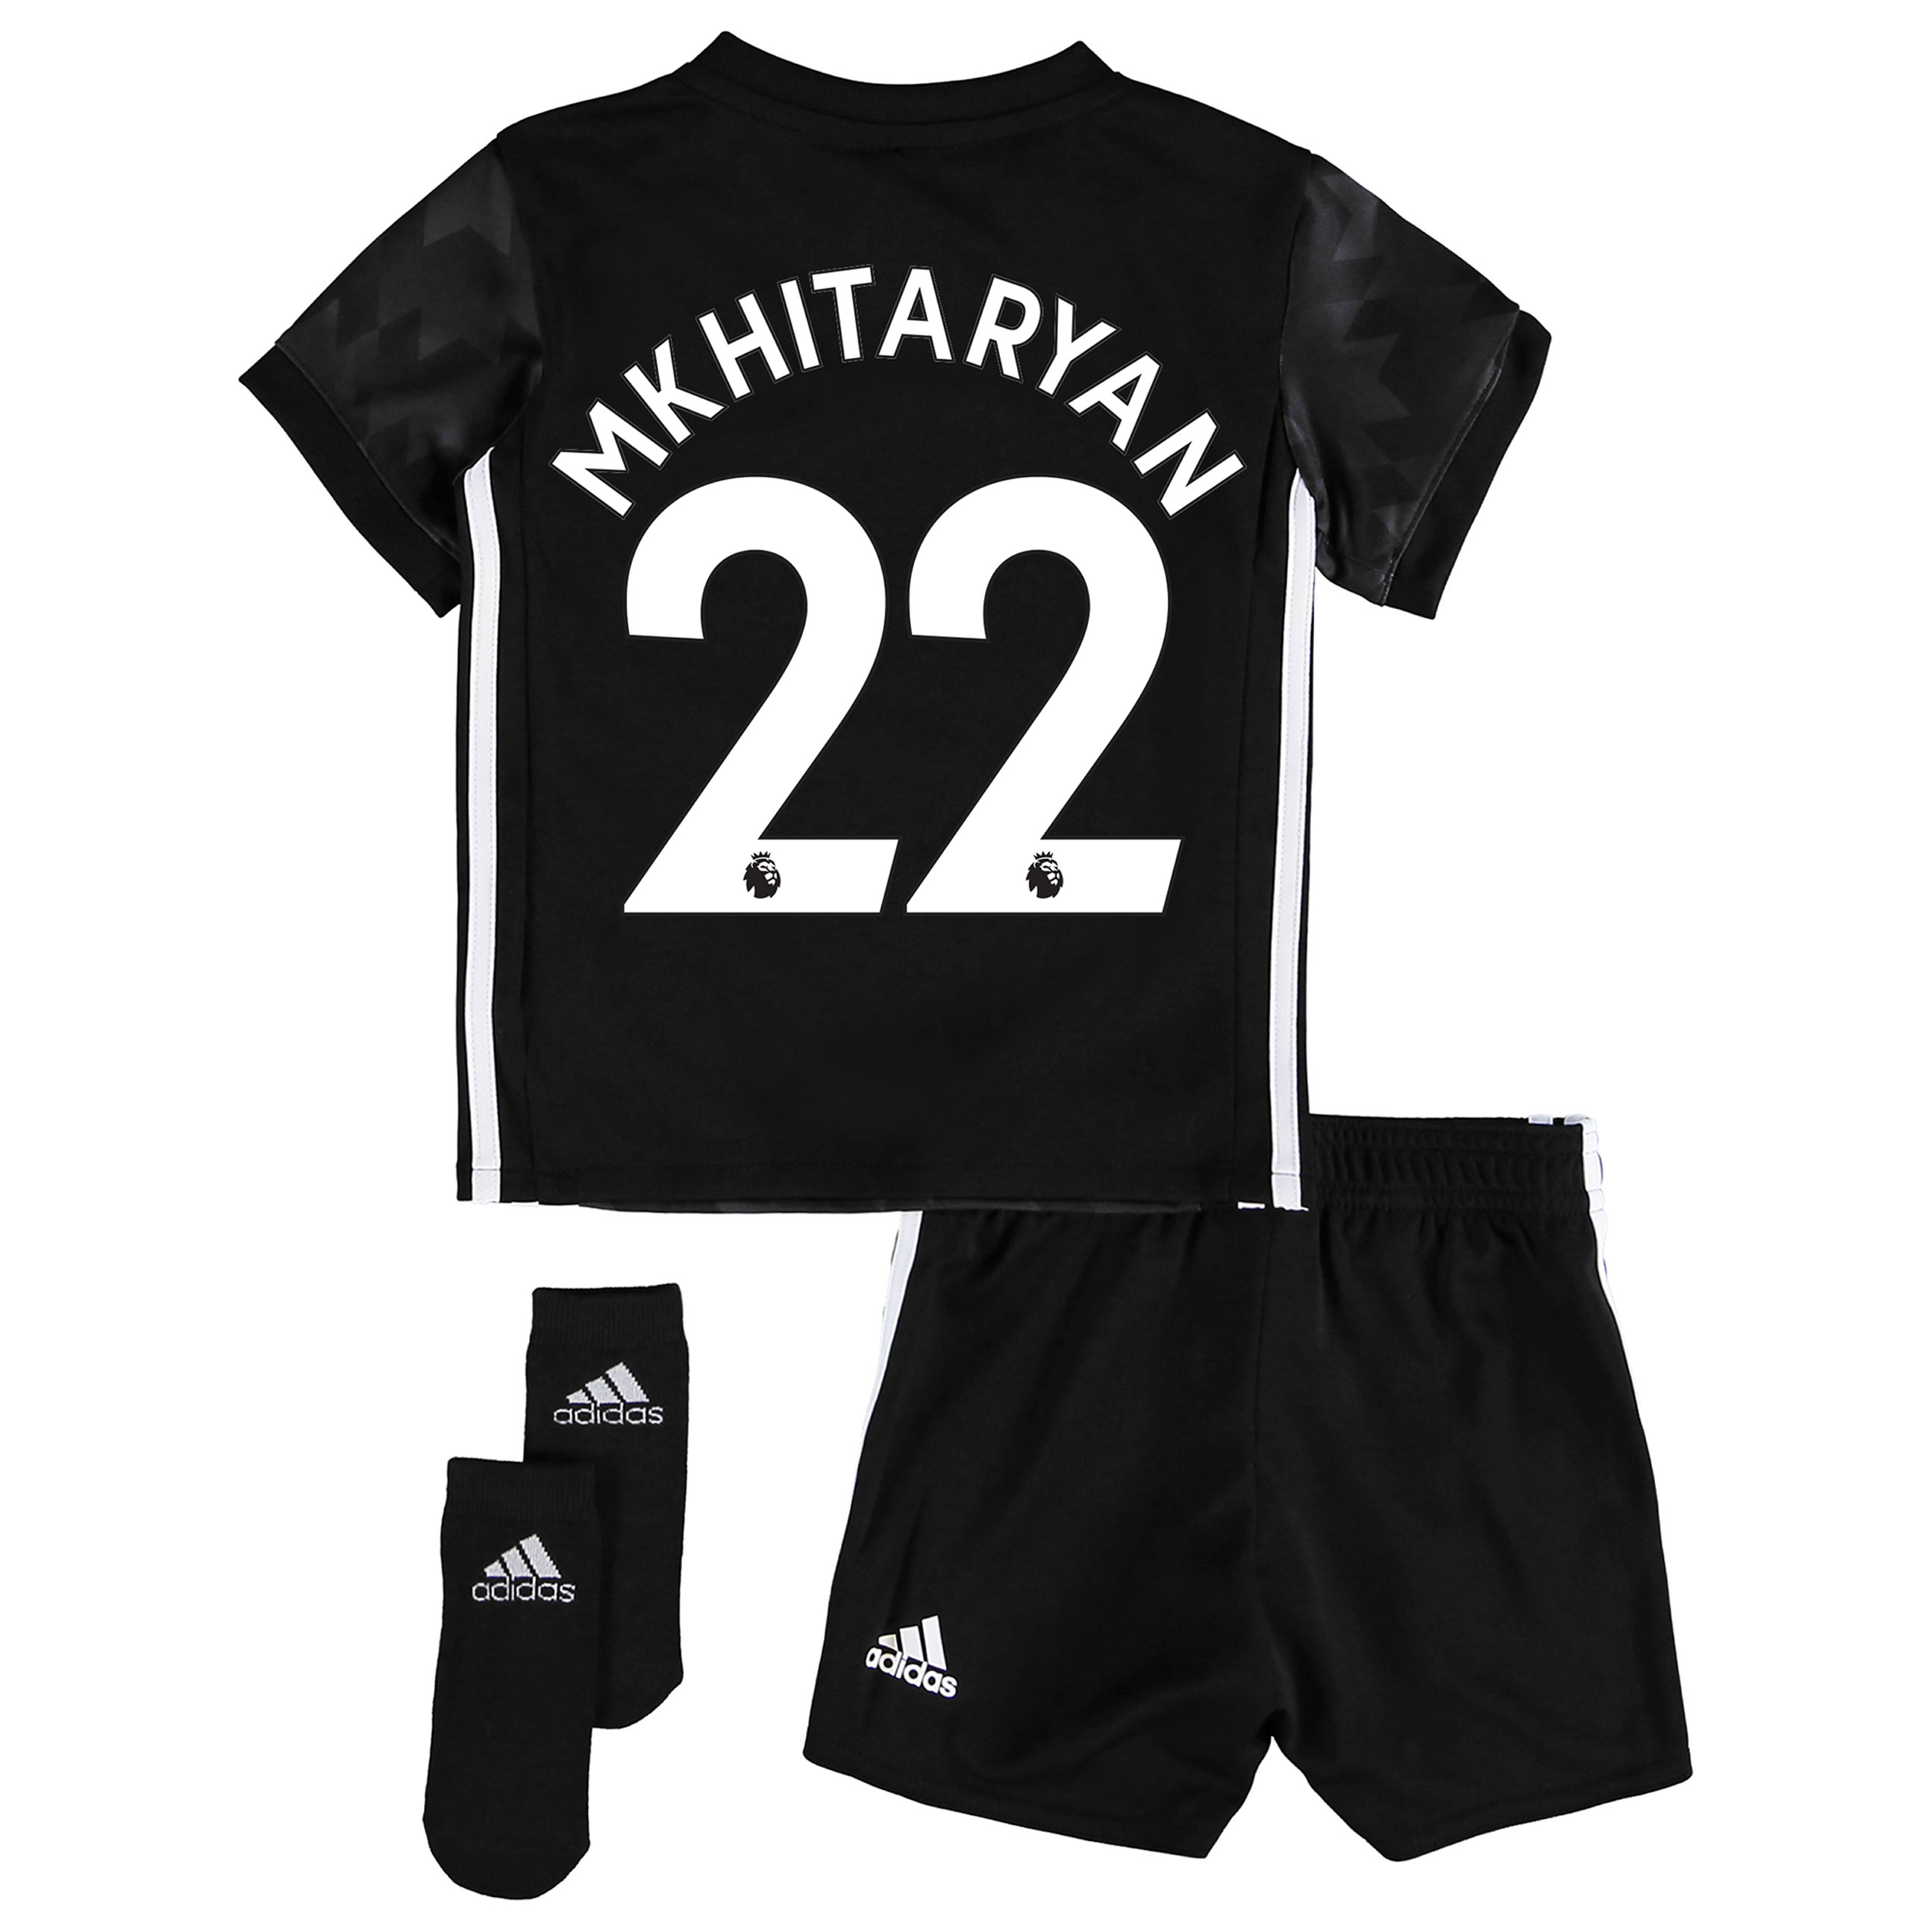 Manchester United Away Baby Kit 2017-18 with Mkhitaryan 22 printing